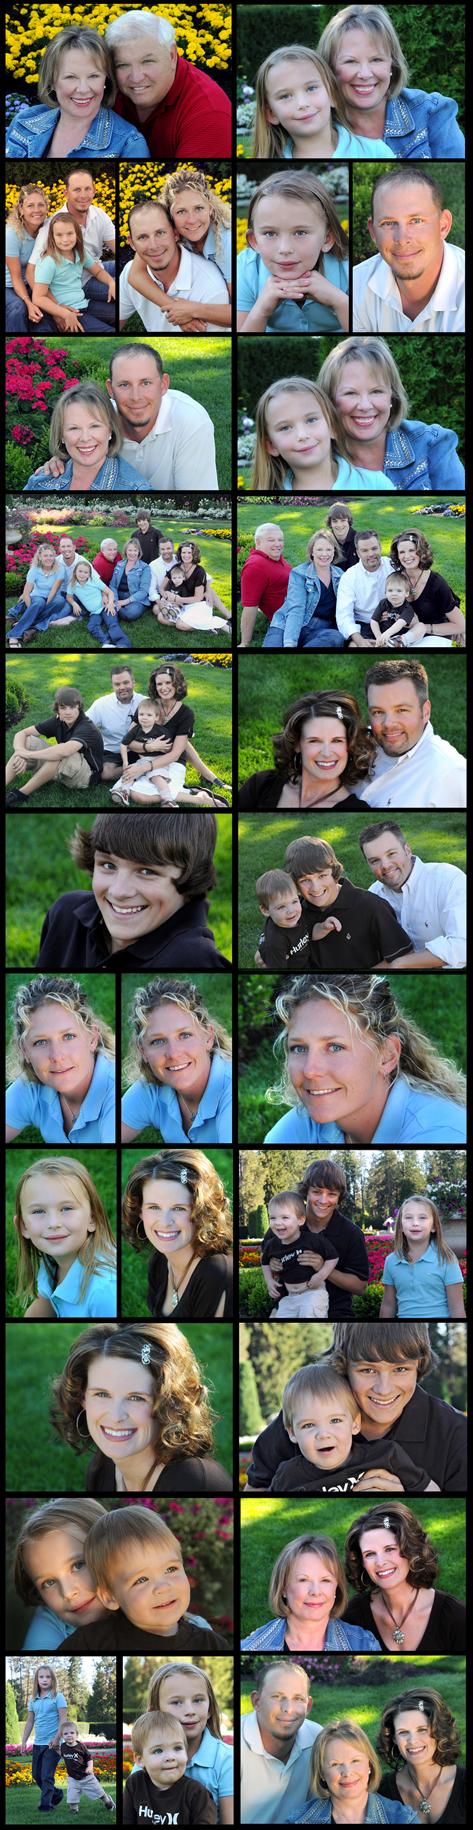 barbcrandellfamily